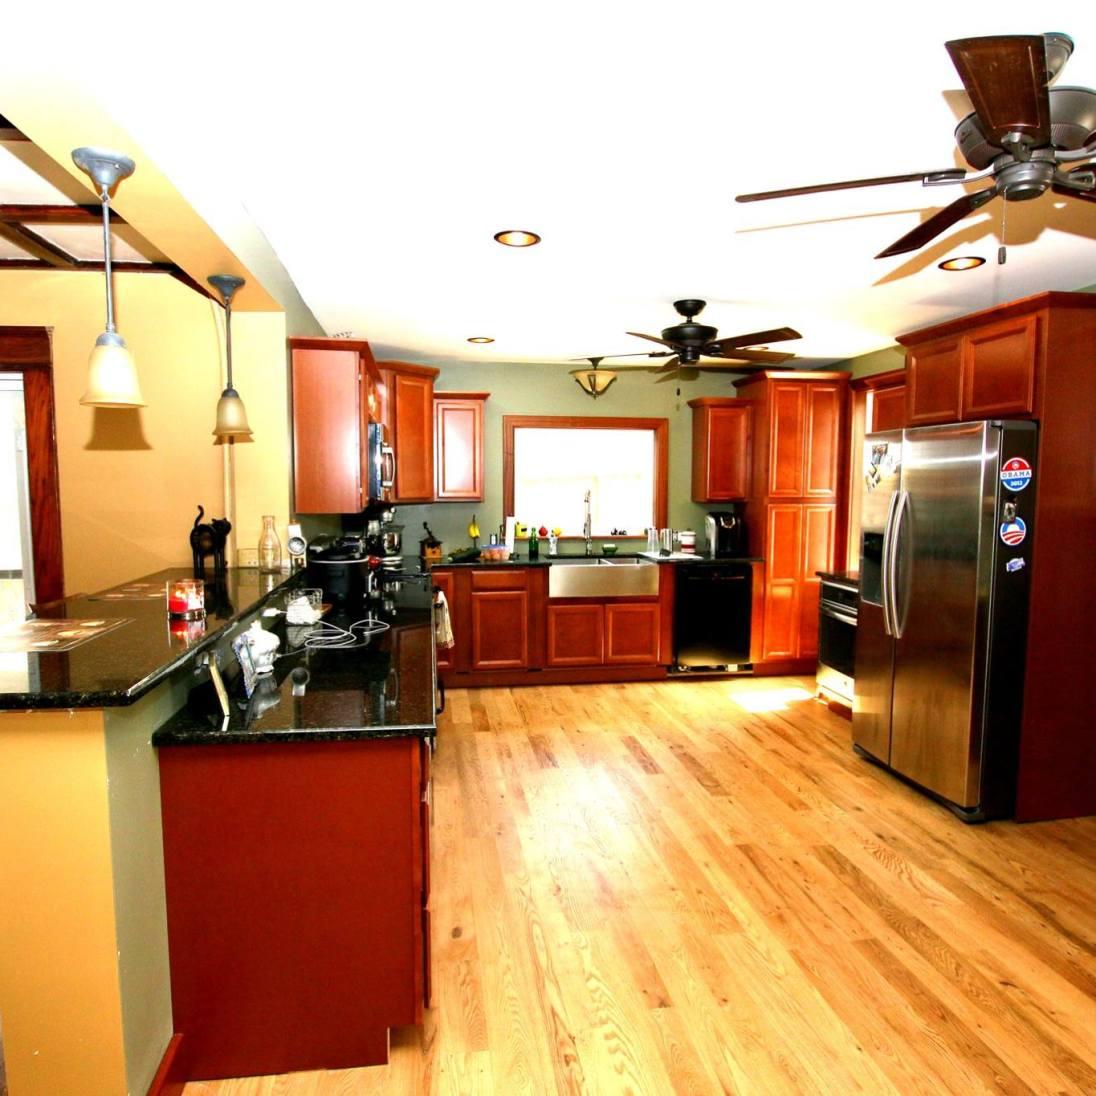 Traverse-City-Hardwood-Floors-Character-Grade-White-Oak-Kitchen-Remodel-02